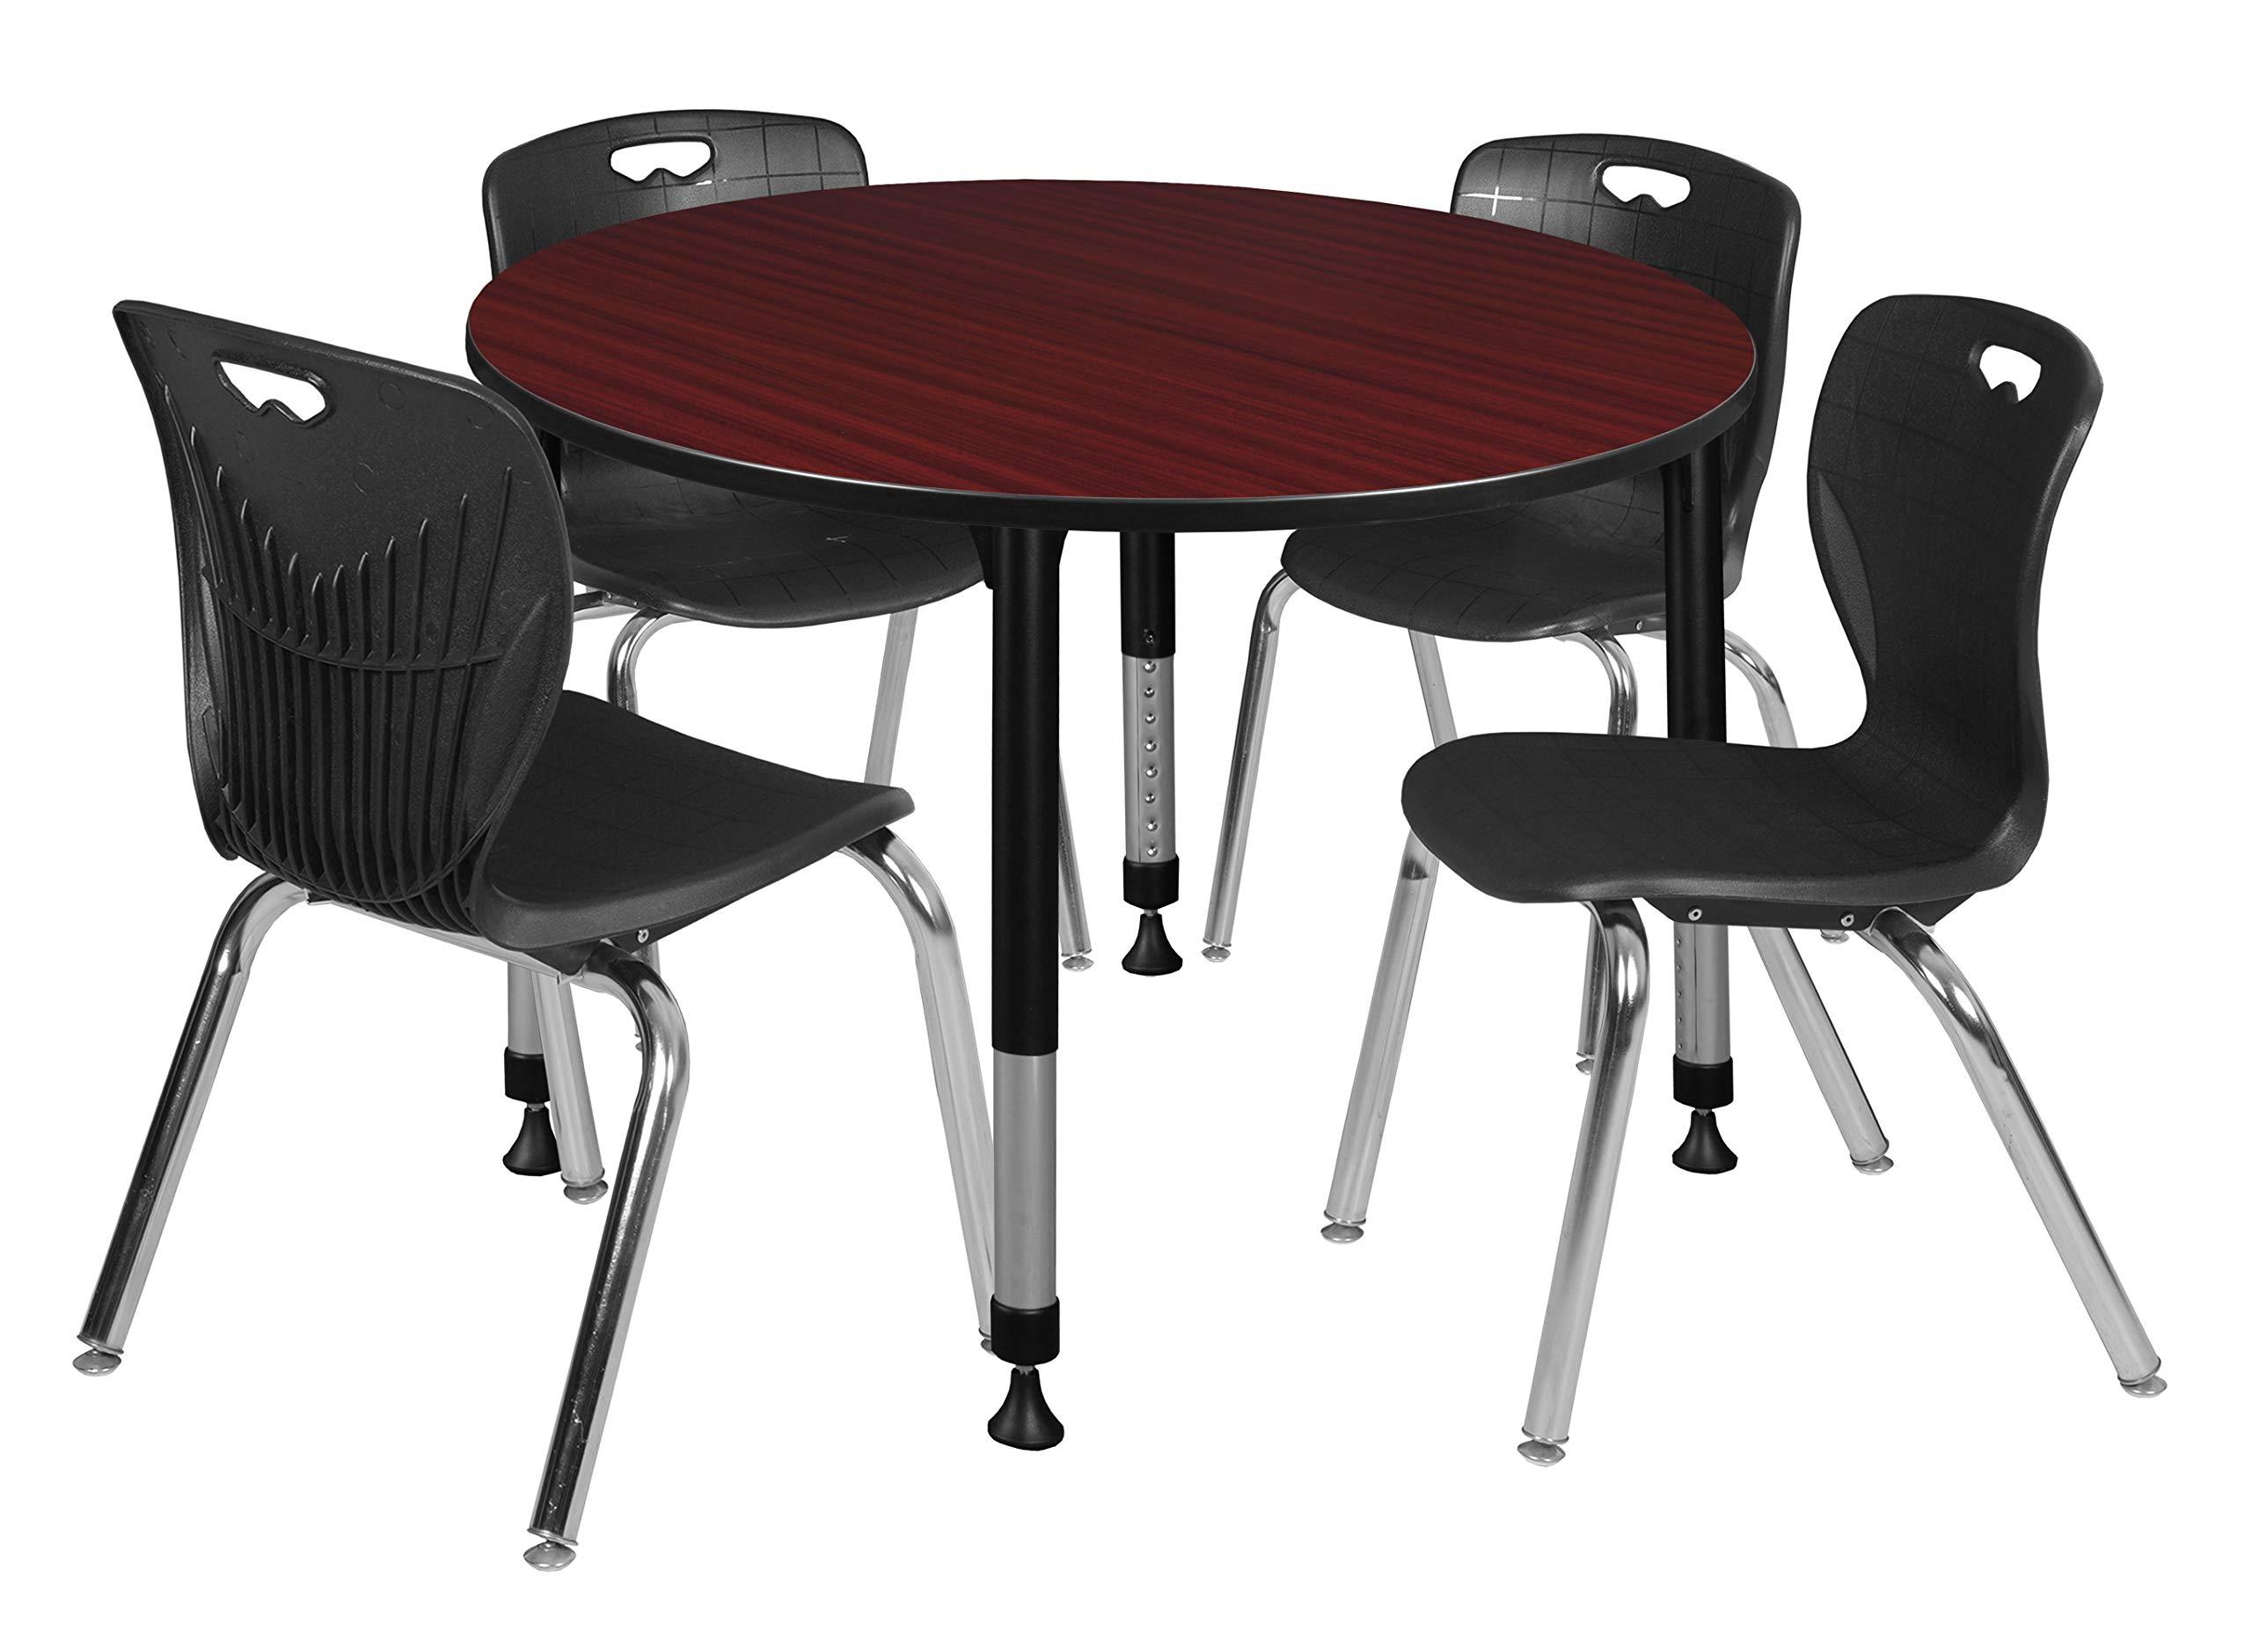 Regency TB48RNDMHAPBK40BK Kee Height Adjustable Classroom Table Set with Four 18'' Andy Chairs, 48'', Mahogany/Black